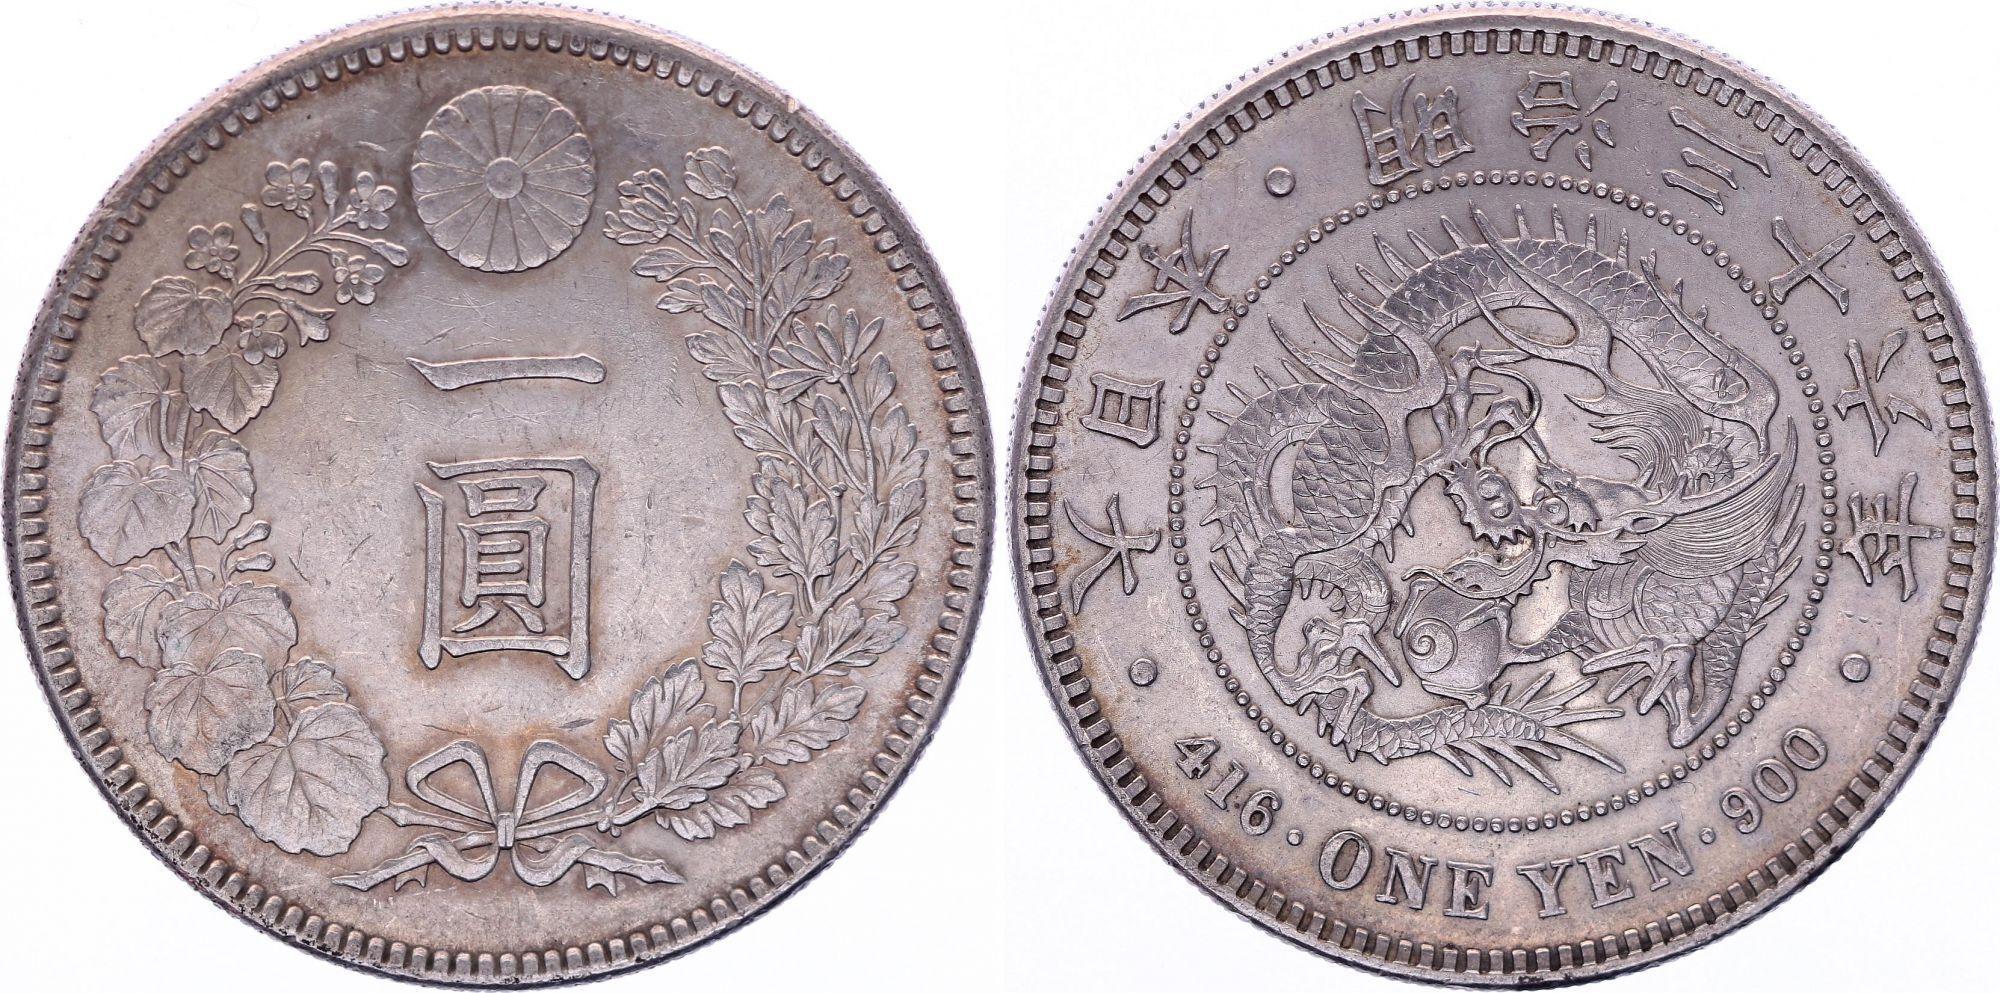 Japan 1 Yen Dragon  - 1905 Mutsuhito Year 38 - XF